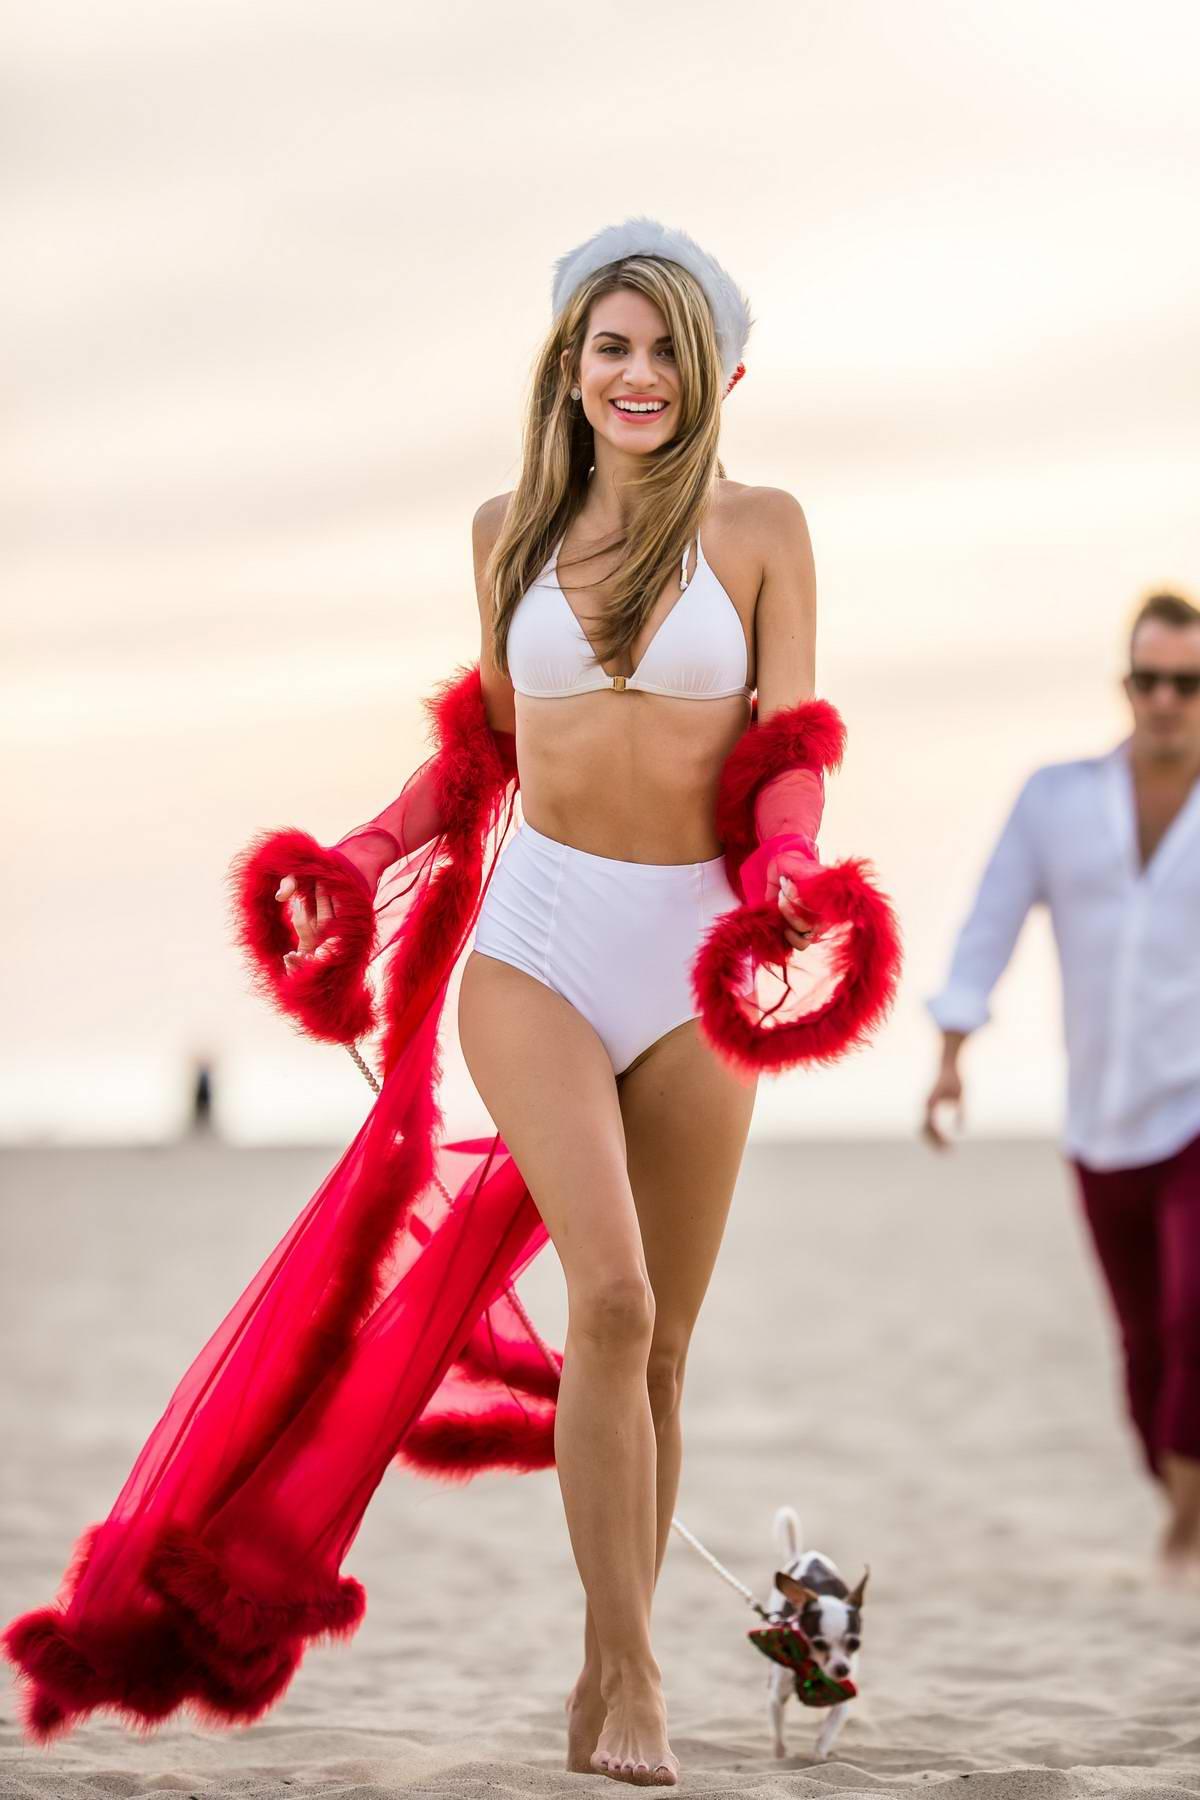 Rachel McCord wears a white bikini with a Santa hat for a Christmas themed photoshoot in Santa Monica, California